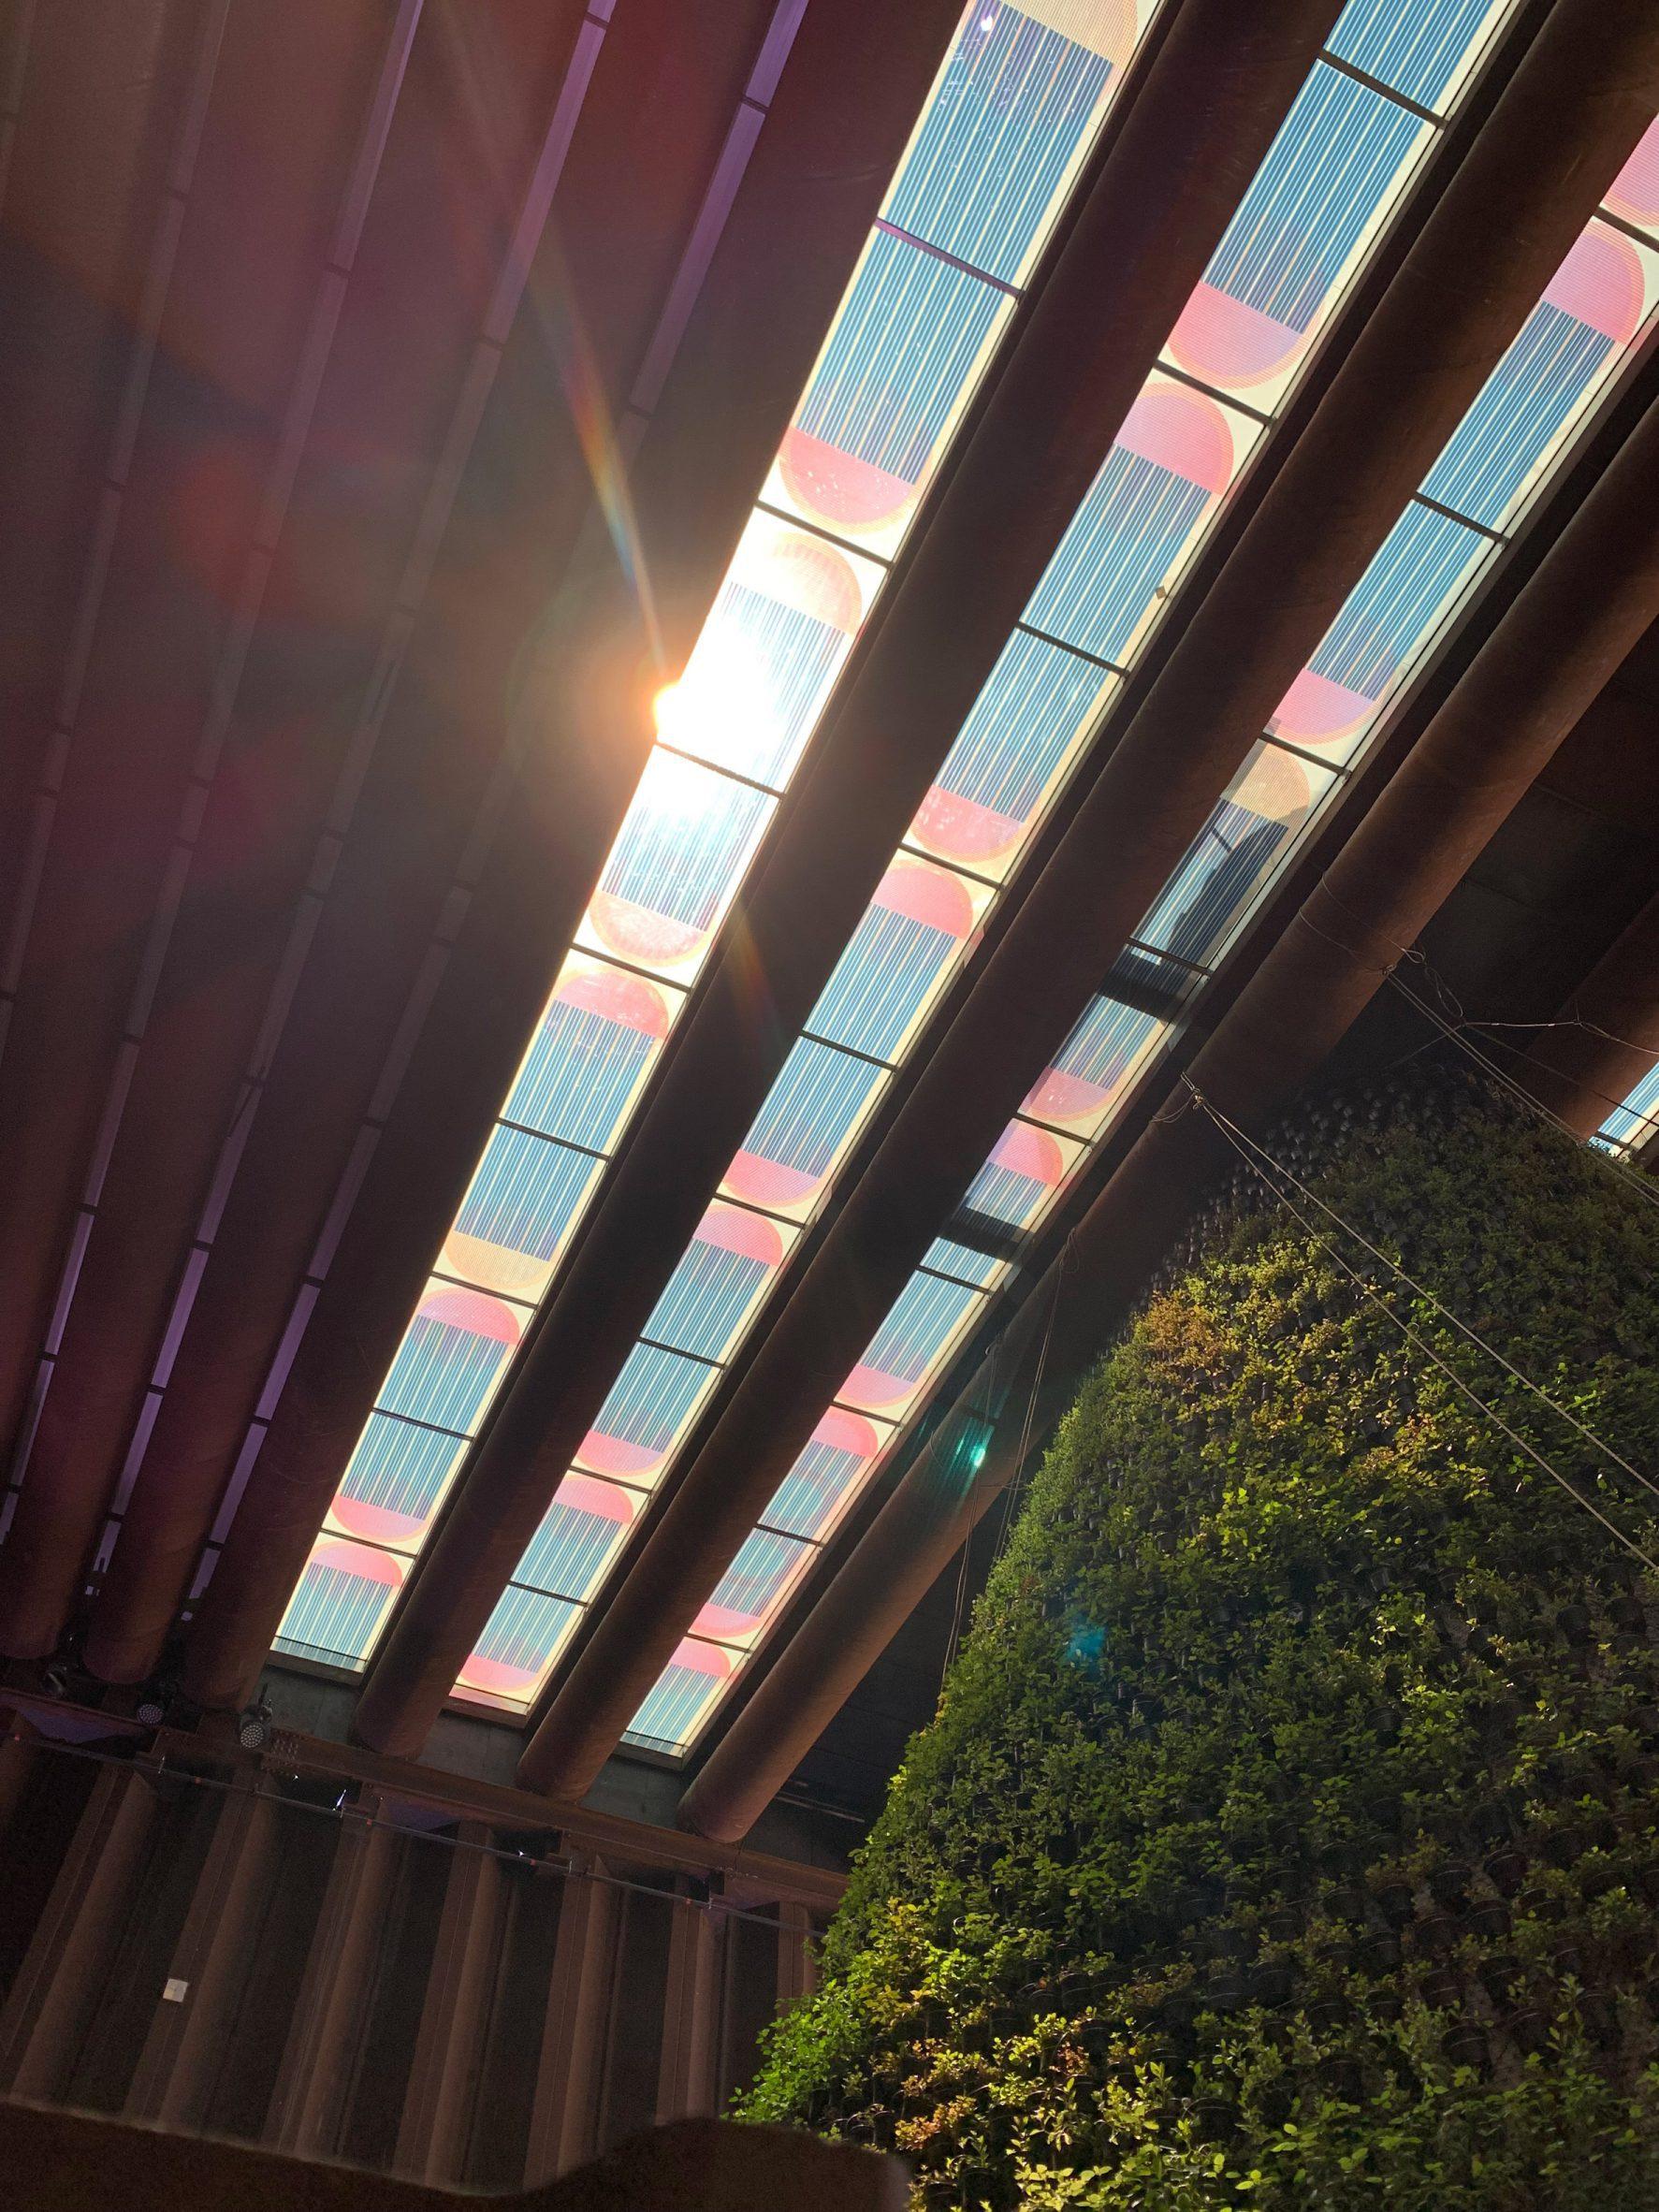 Coloured translucent solar panels forming a skylight above a vertical garden